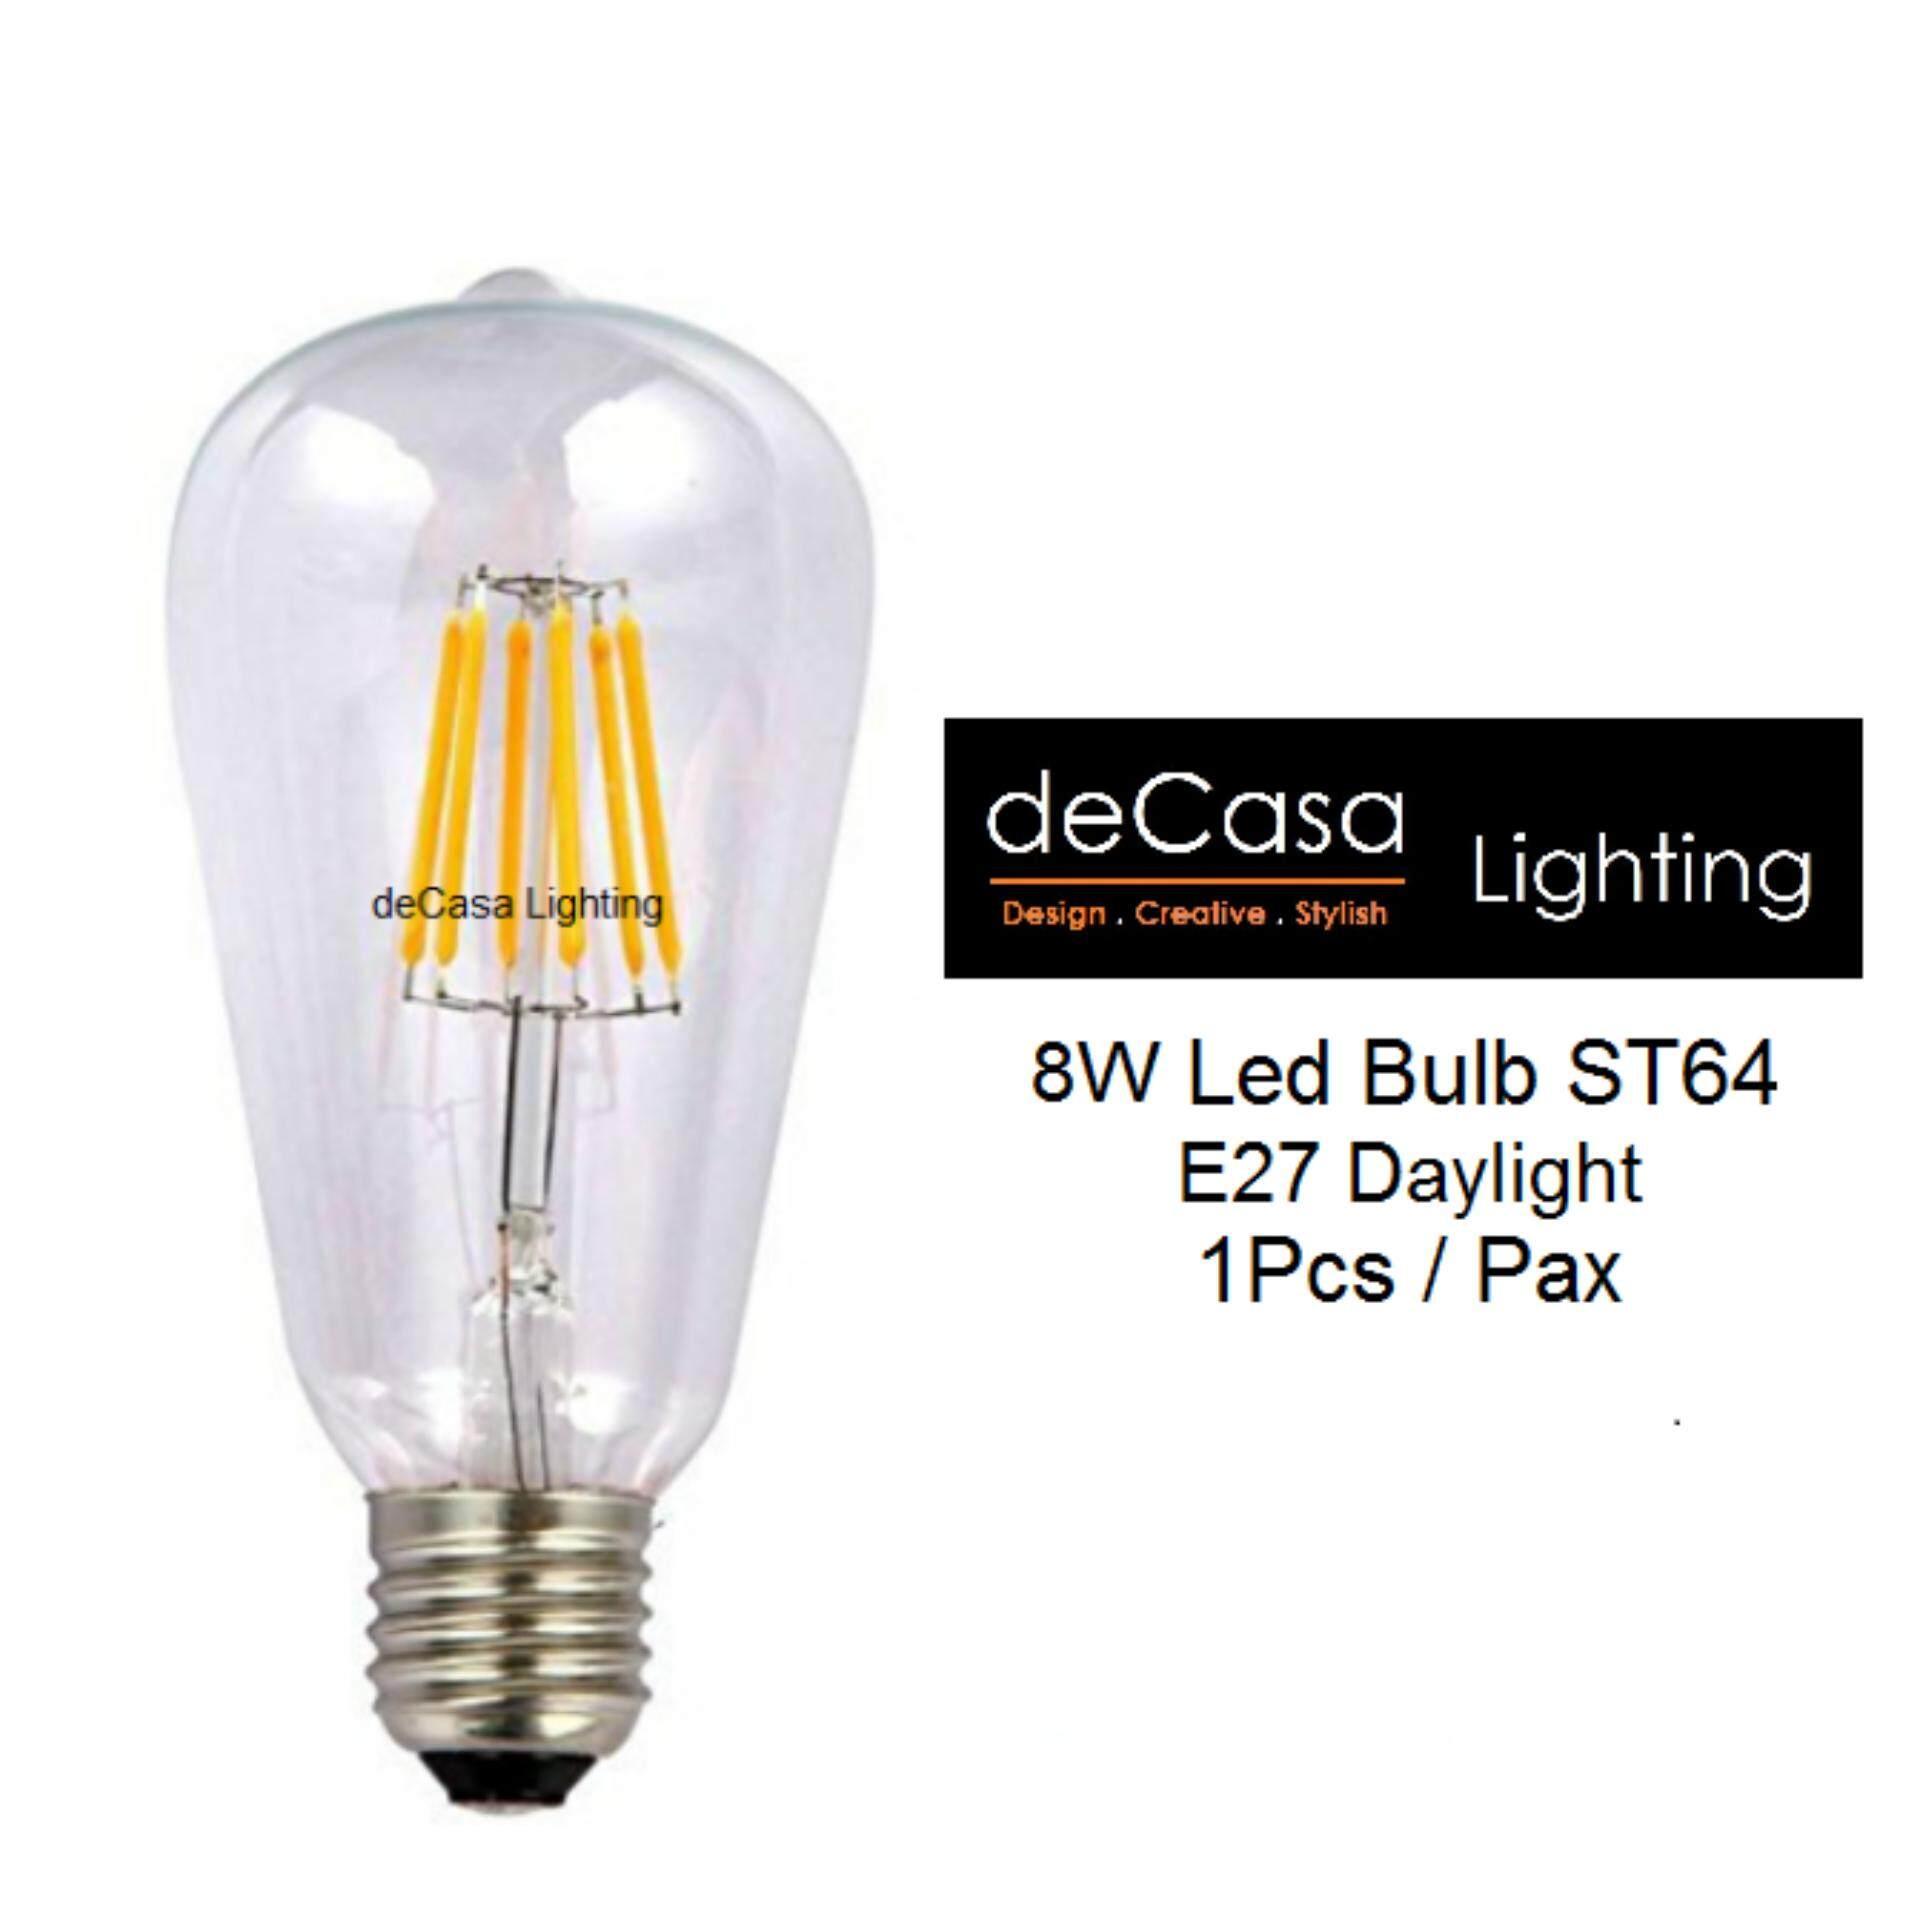 Edison ST64 E27 COB-8watts Daylight / Warm White DECASA EDISON LED BULB- (LY-ST64-8W-E27-WW/DL)